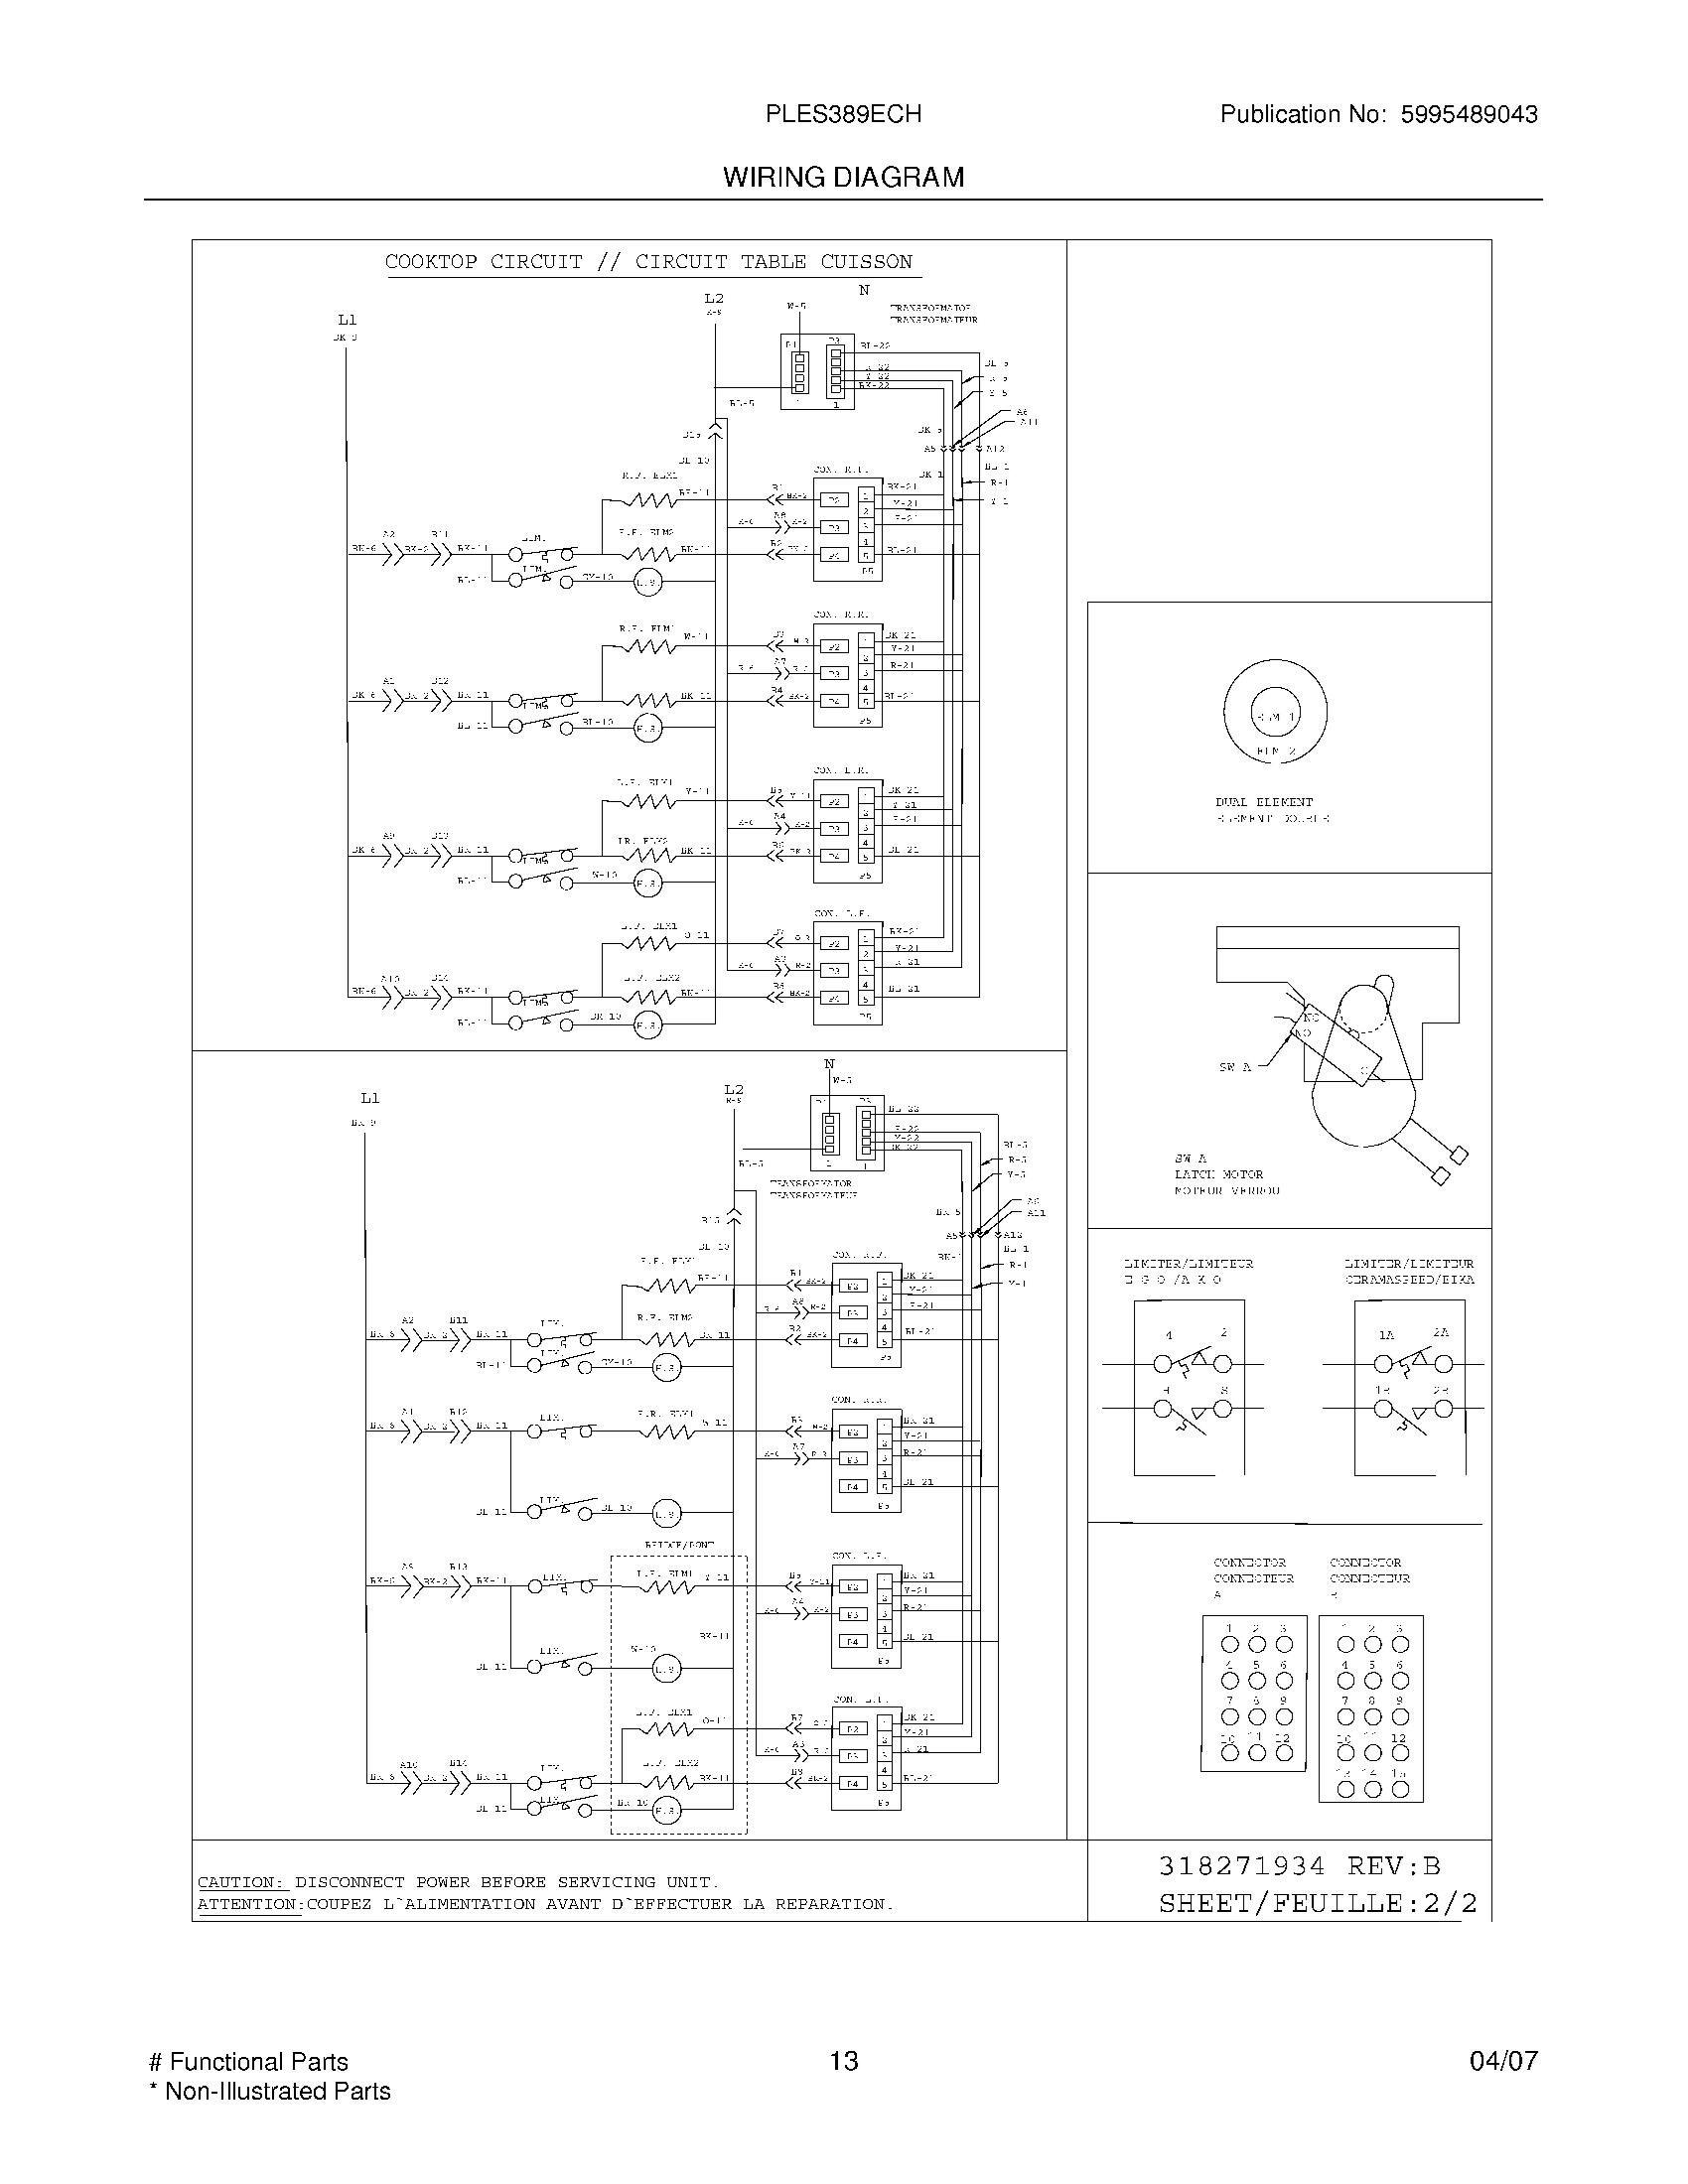 Ke70 Alternator Wiring Diagram: Awesome Ke70 Wiring Diagram Images - Electrical and Wiring Diagram